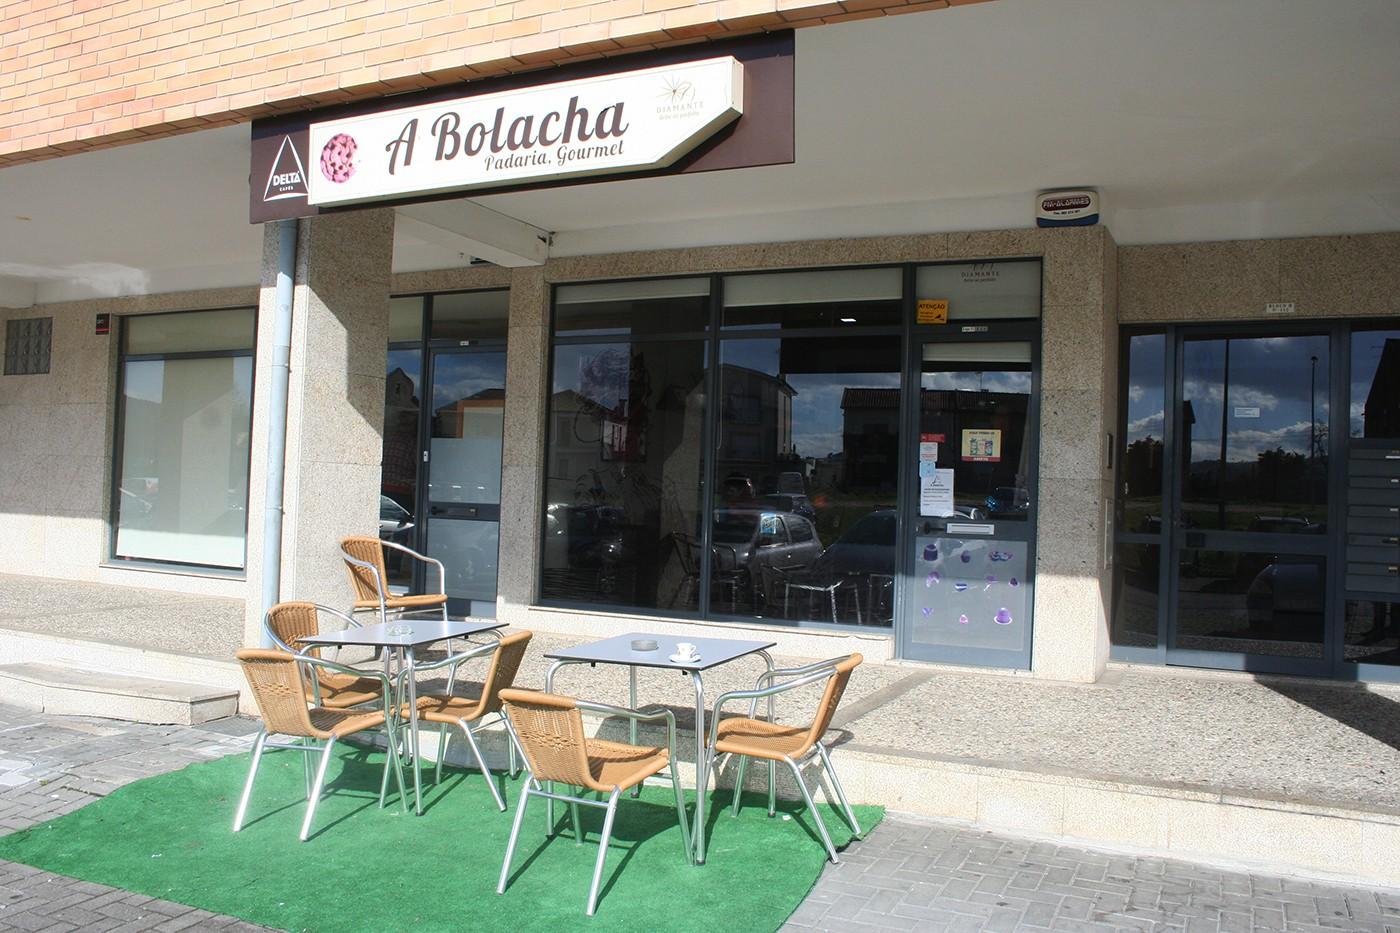 A Bolacha - Padaria e Pastelaria Gourmet